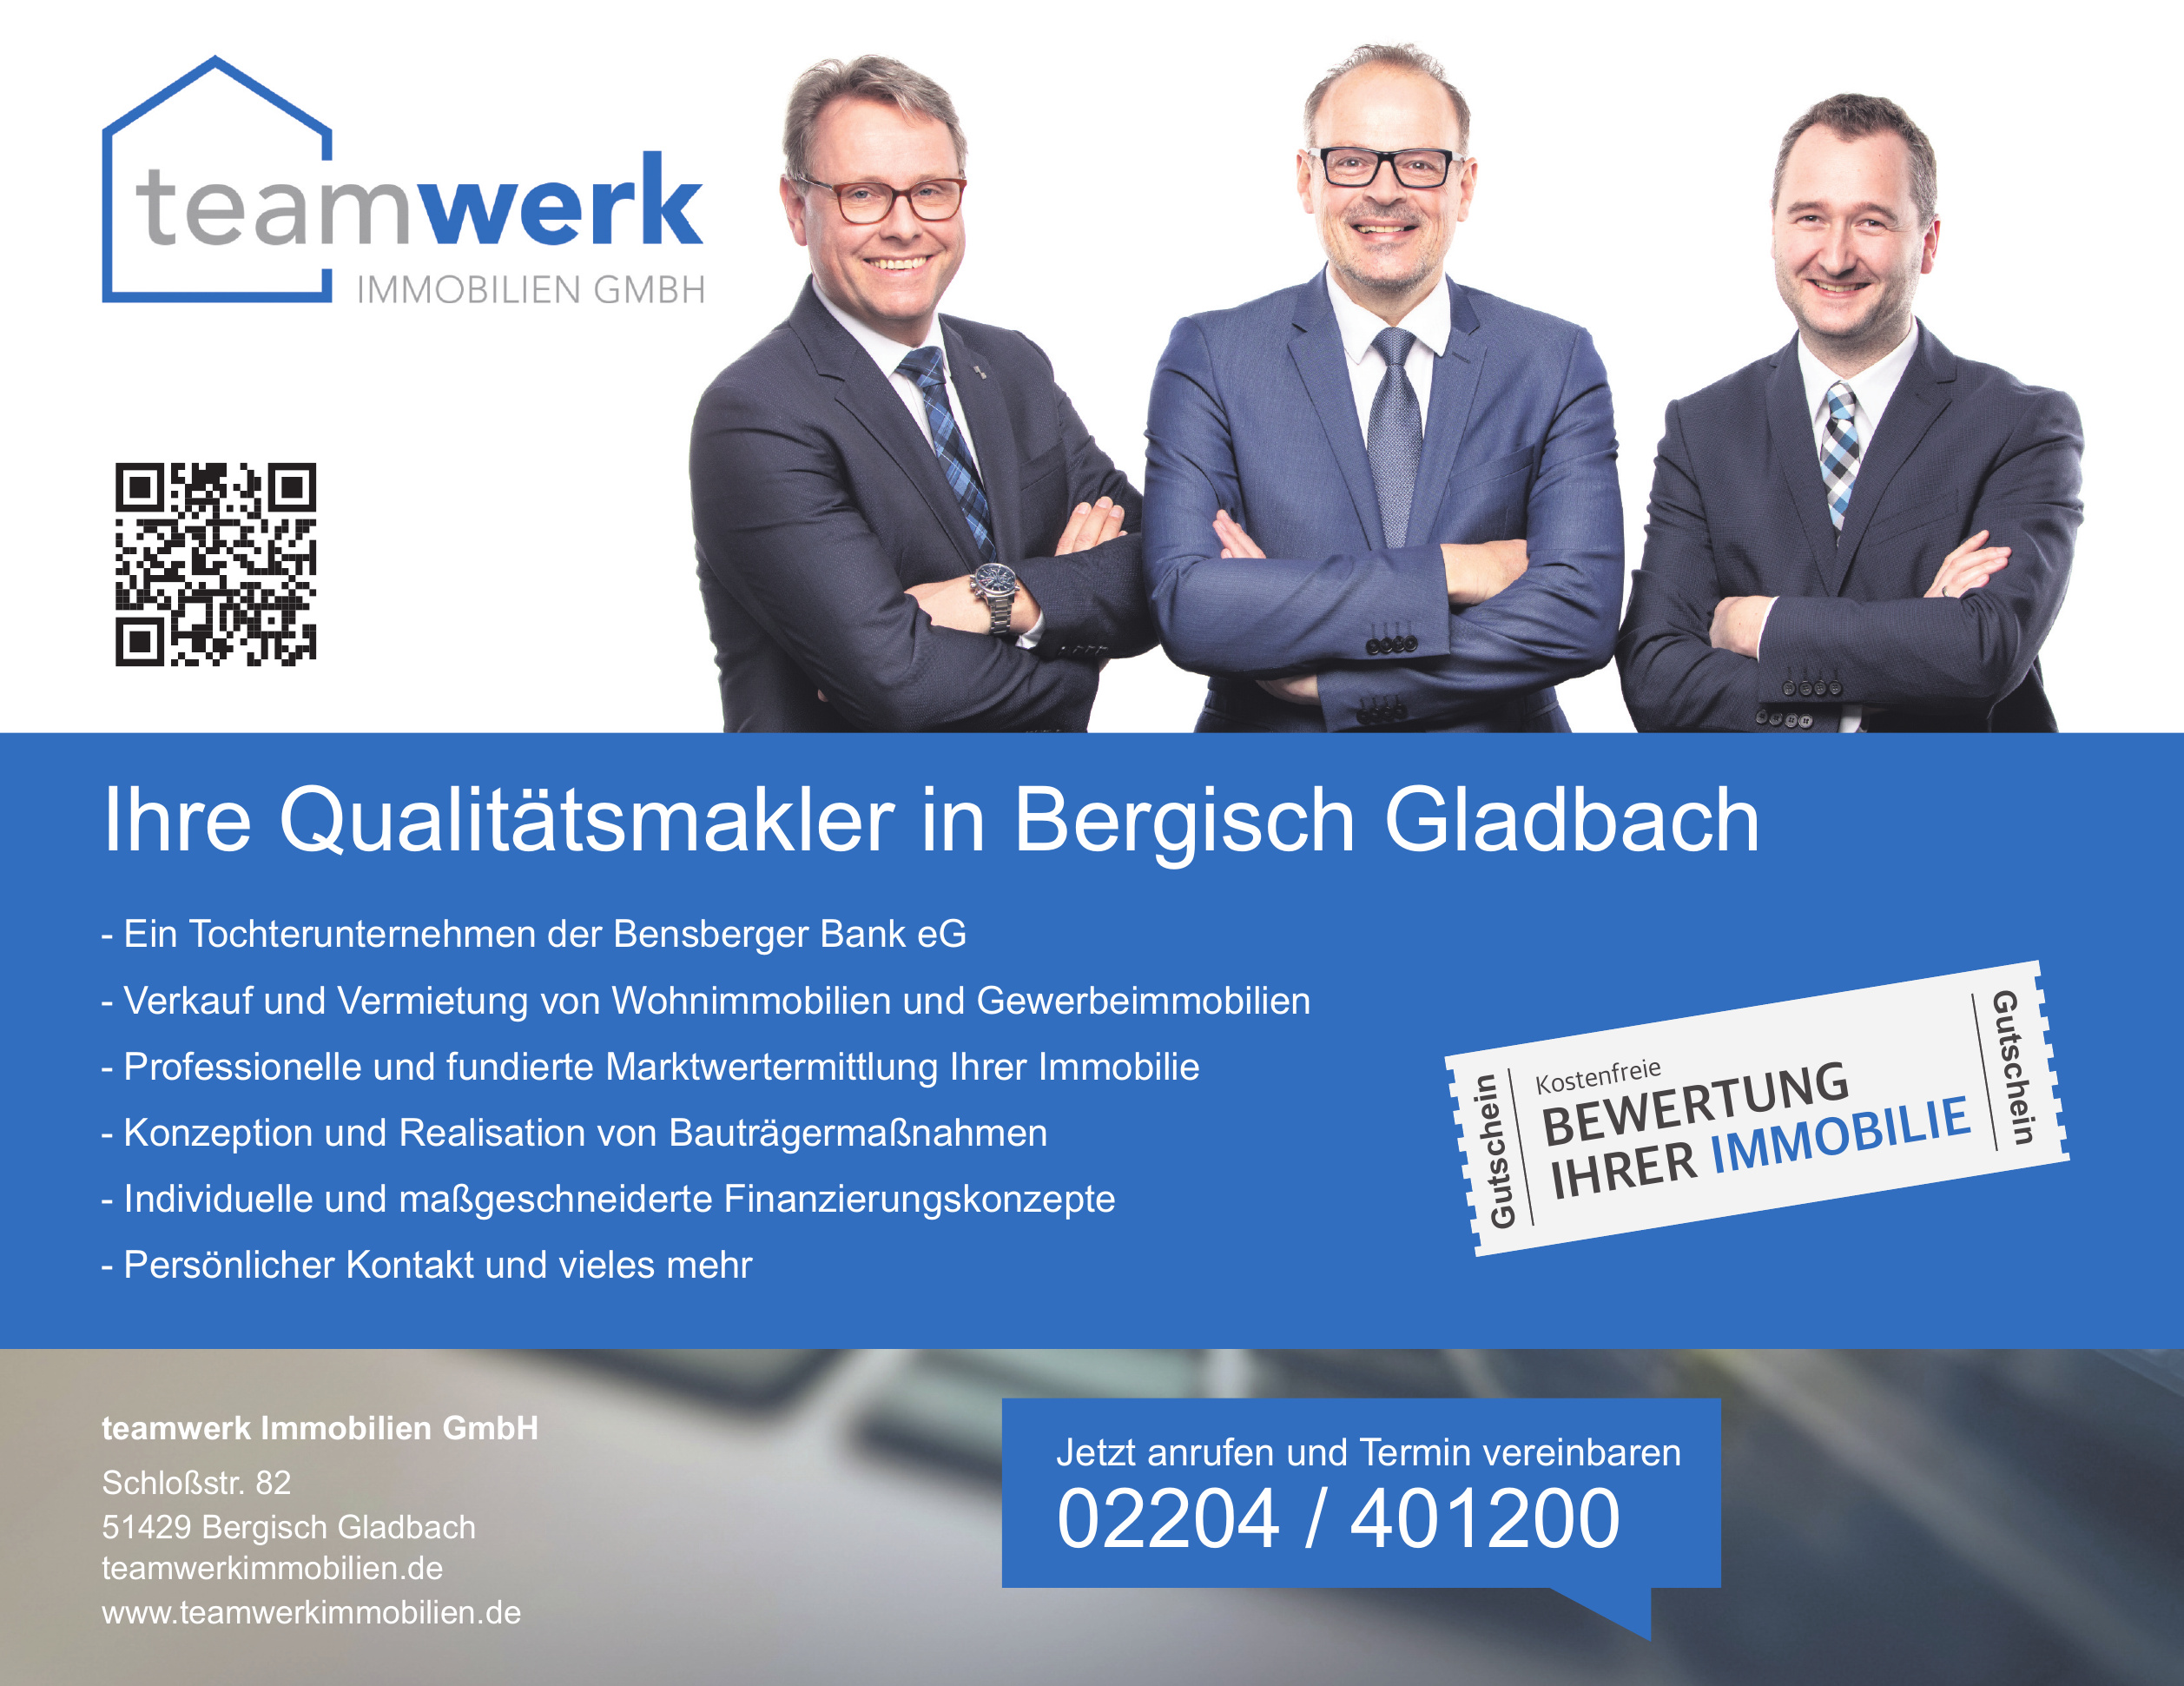 teamwerk Immobilien GmbH